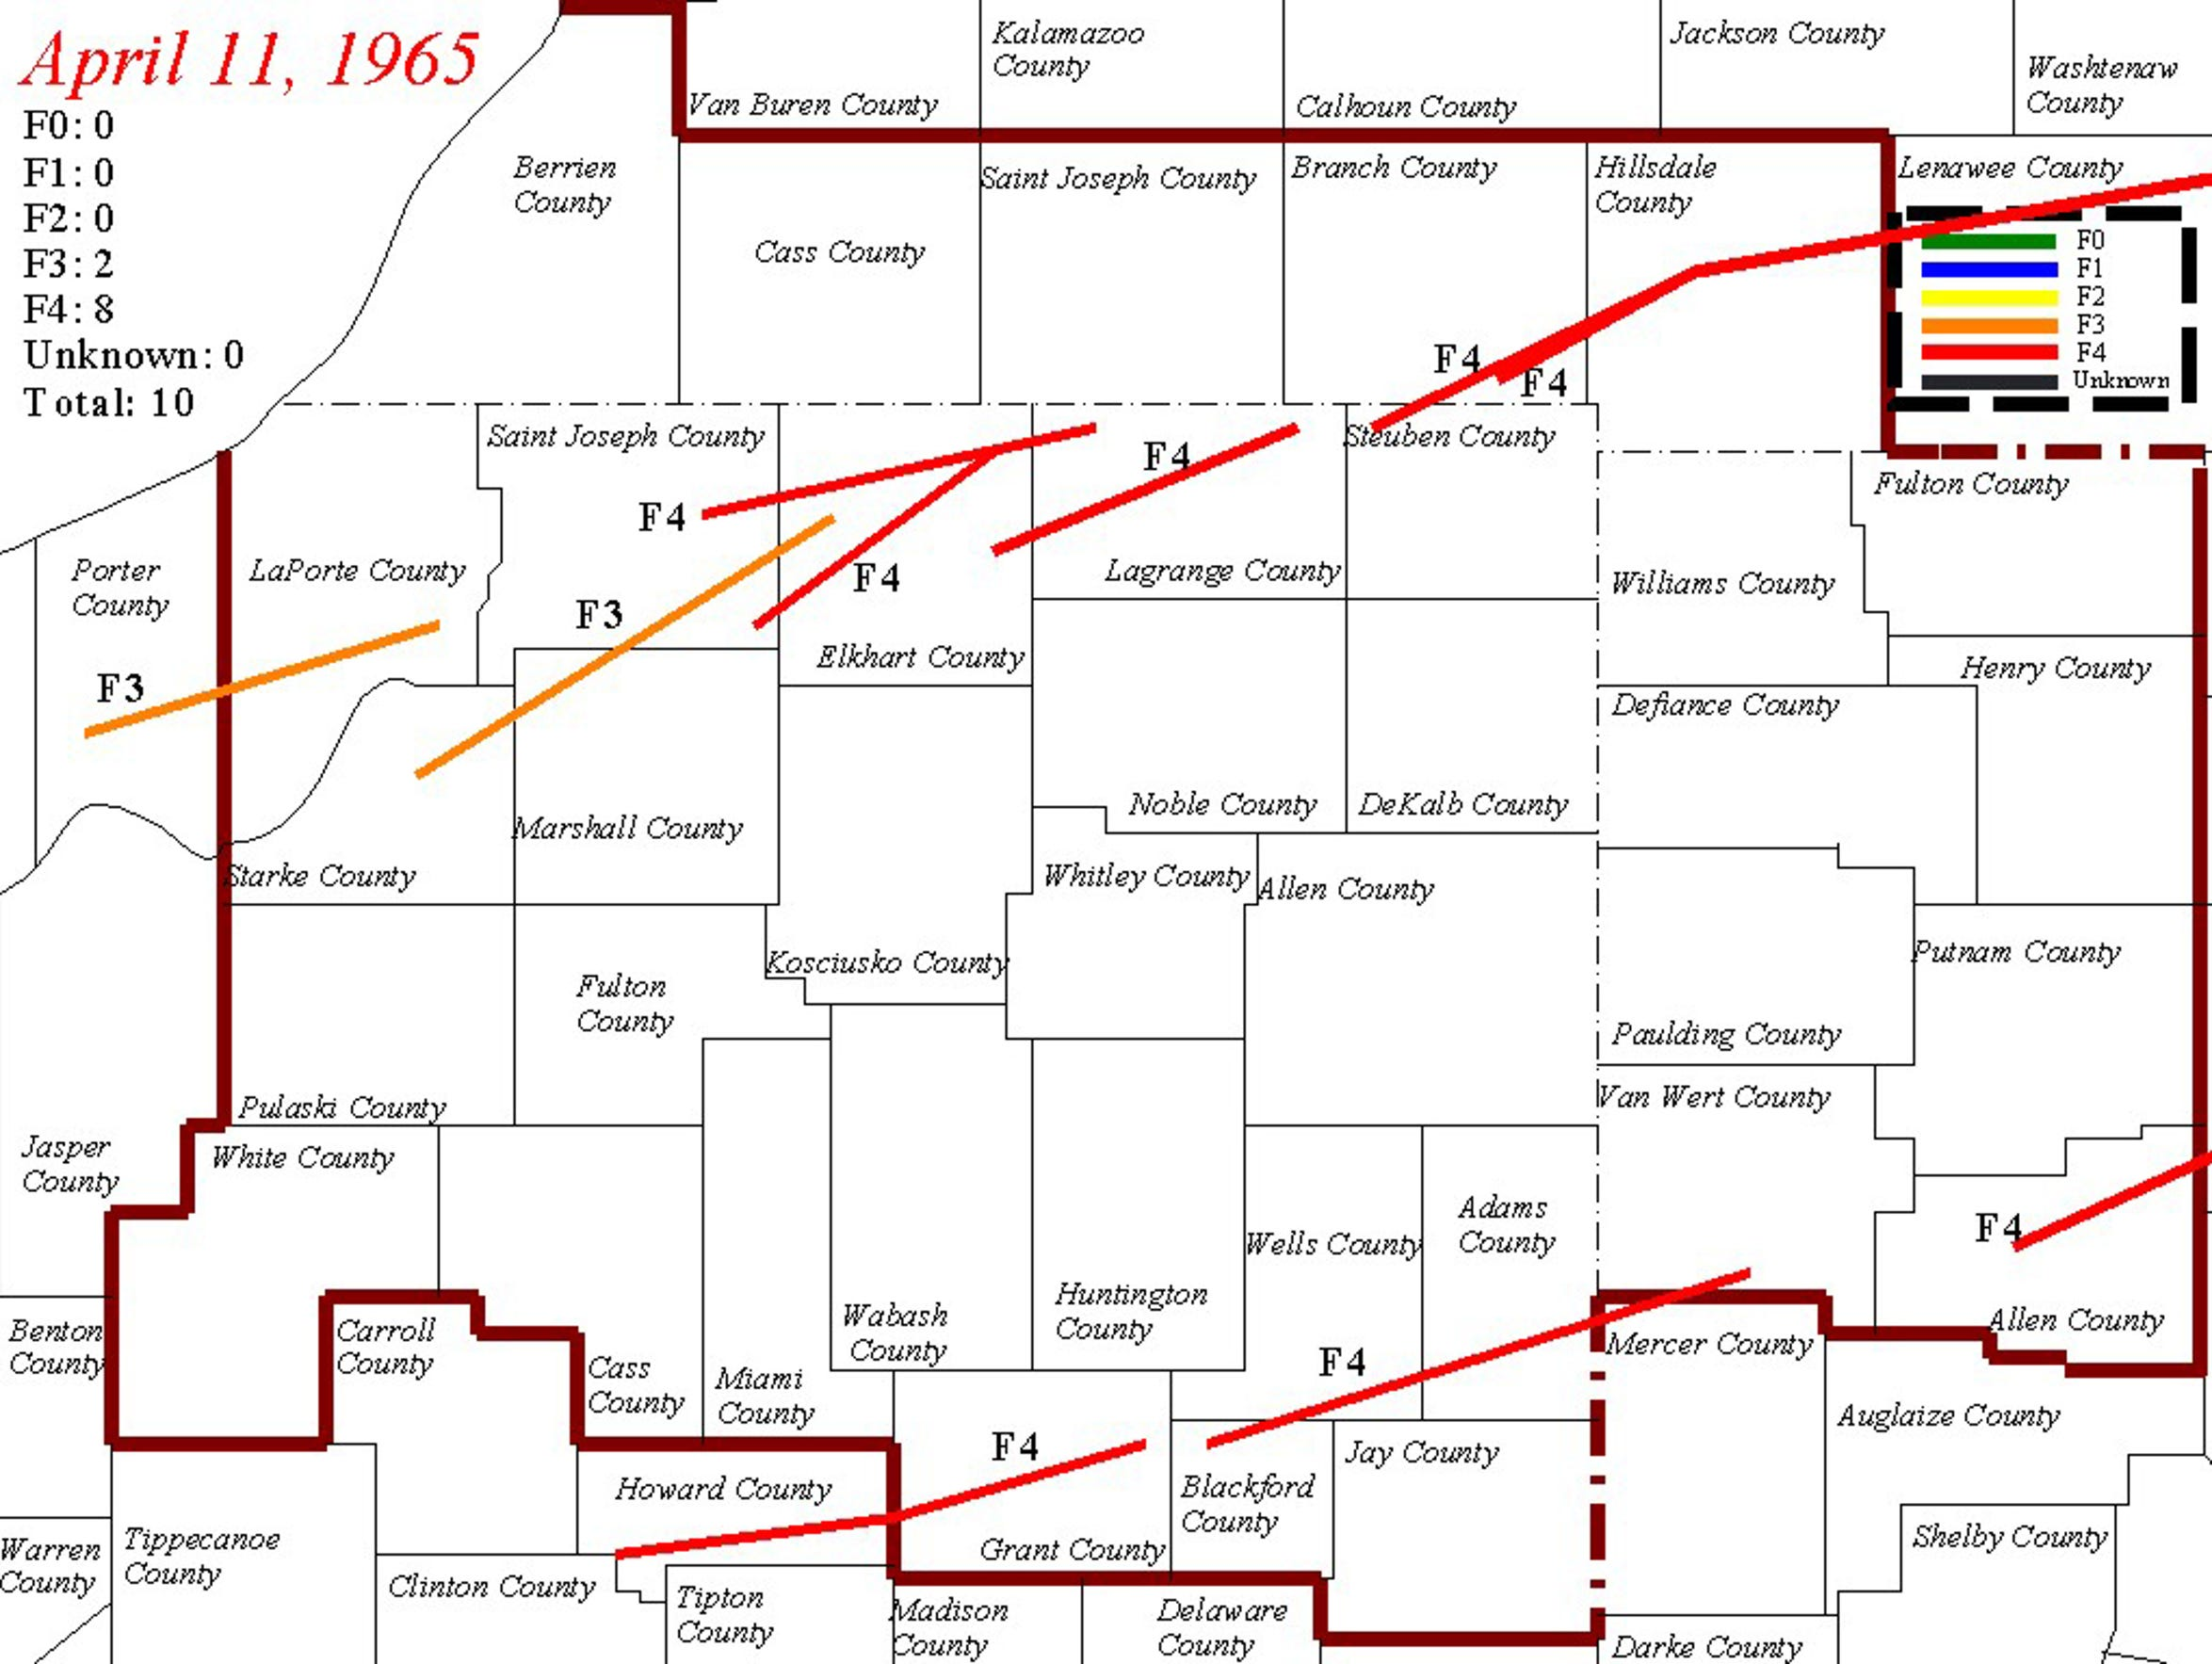 Map of tornado tracks from the 1965 Palm Sunday tornado